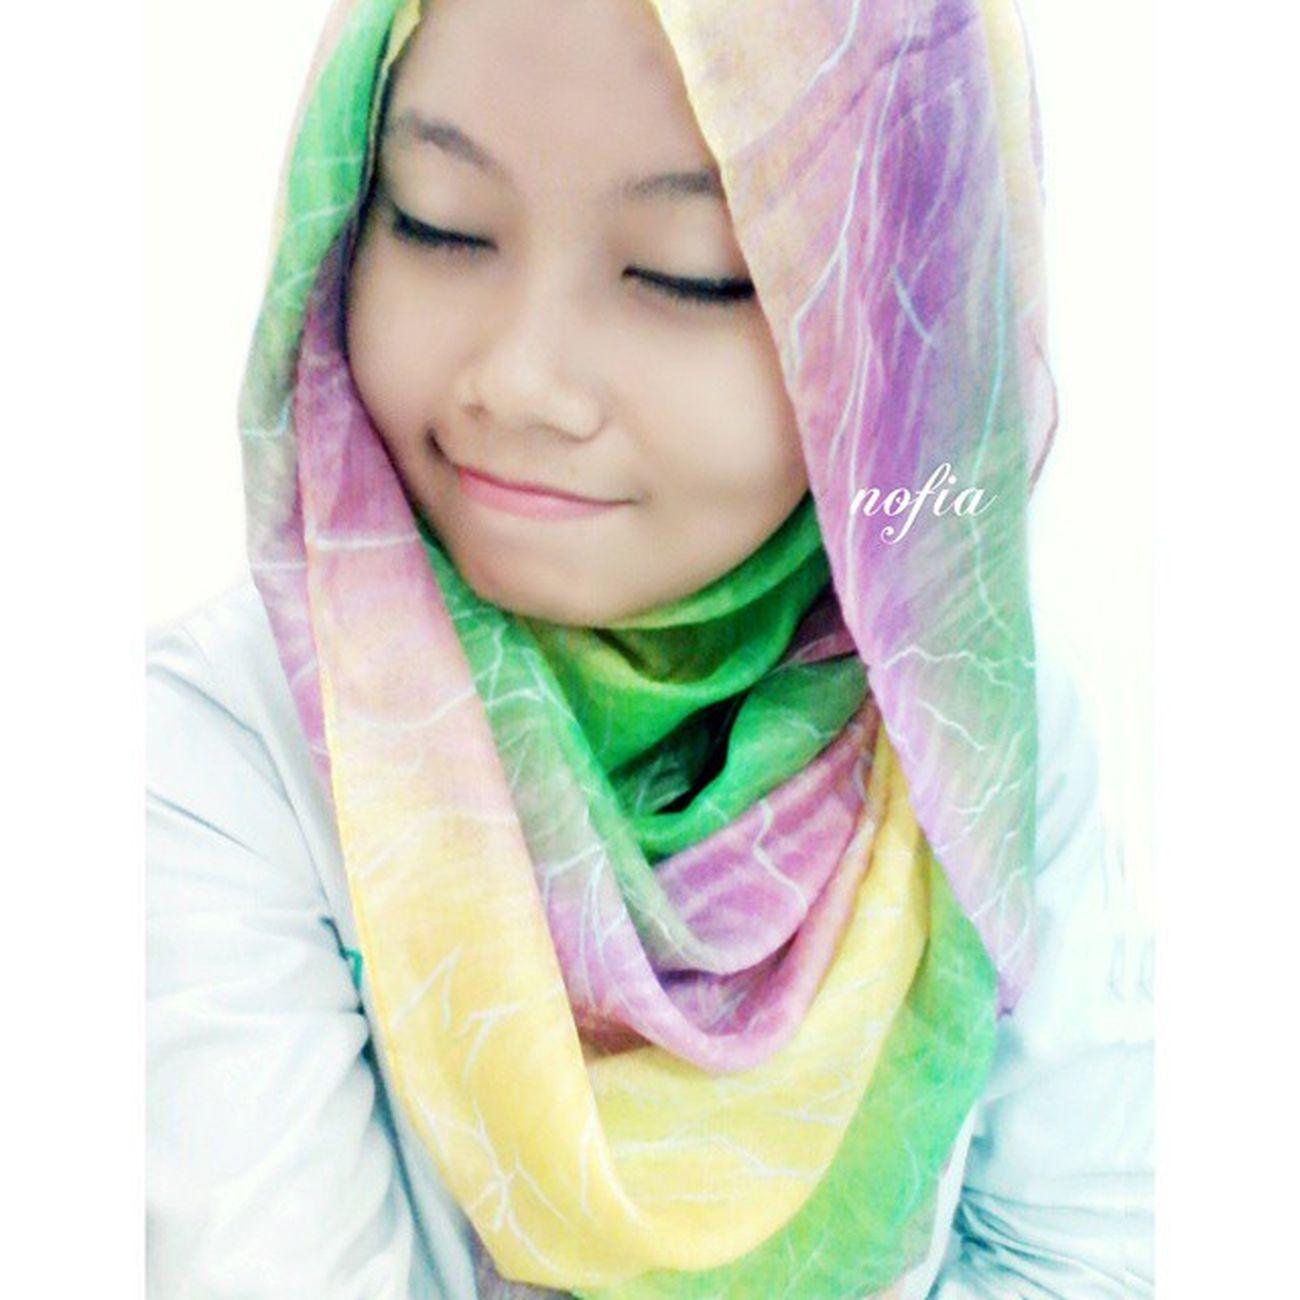 Jangan meminta orang lain untuk menghargai mu, tapi hargai orang lain karna mereka akan menghargai mu. Jumat berkah , Insallah . BTW , kayanya aku gemuk banget ya sekarang. Faktor ngemil nih , huhuhu. Grils, jilbab ku cucok kan ???? koleksi @jilbab_love yang unyu-unyu badai. haha Me Selfie LOL Jilbab hijab photooftheday instamorning bestoftheday instahome indonesiaonly smartfren c360 andromaxc ipiccy